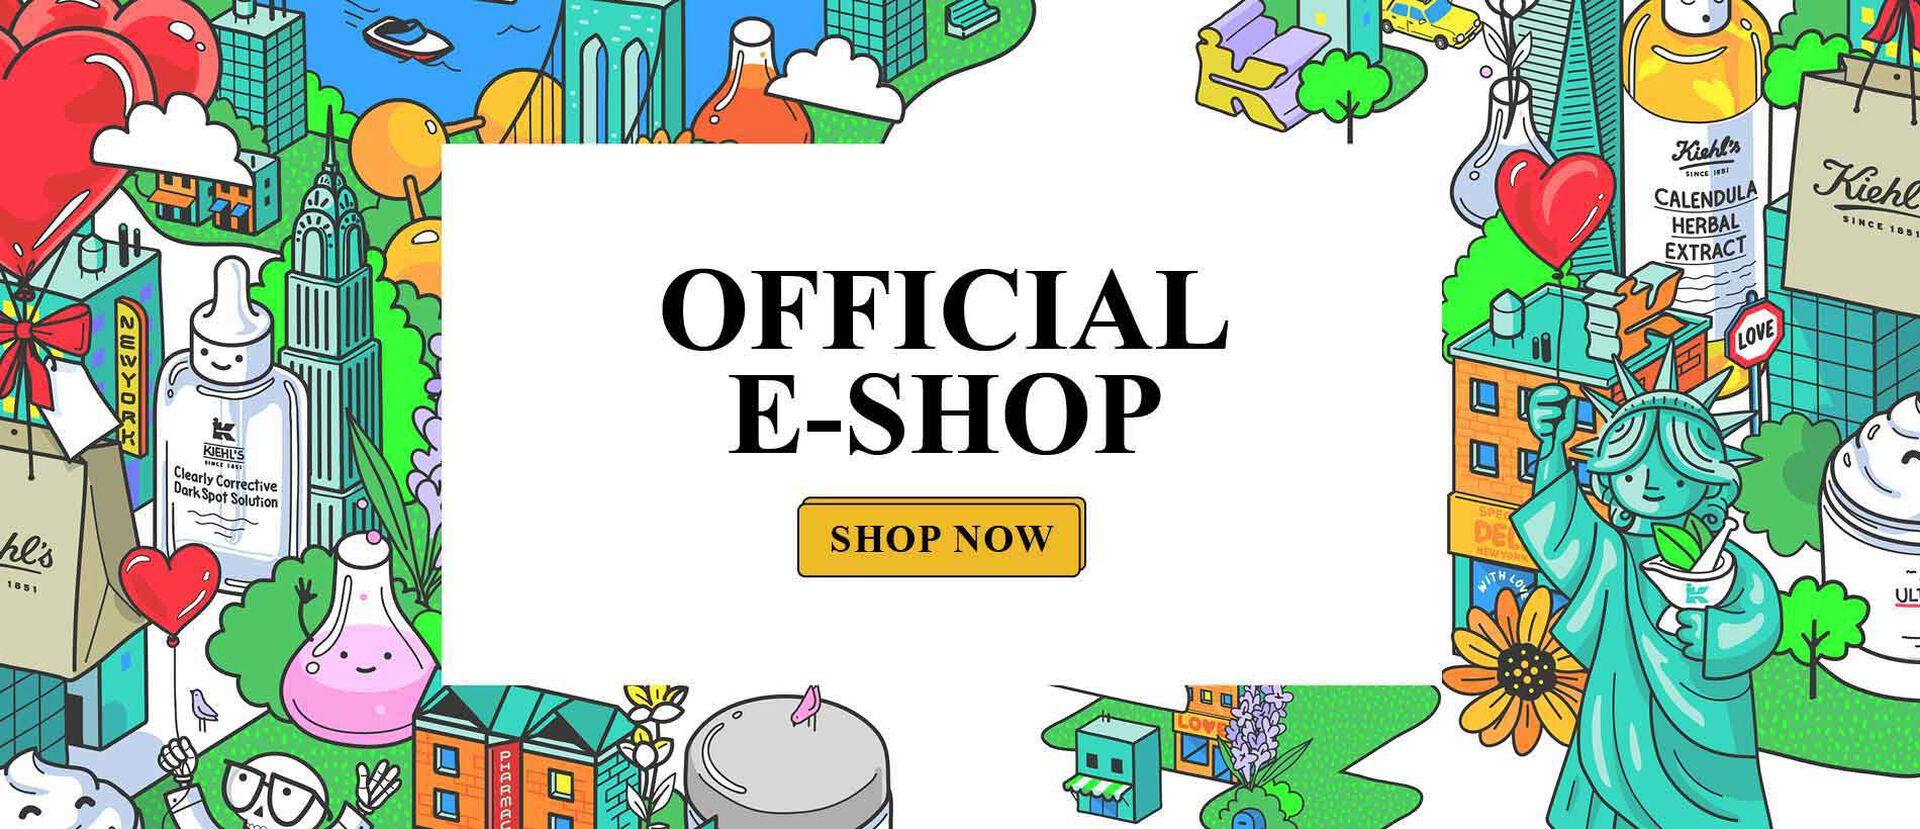 Kiehls E-Shop